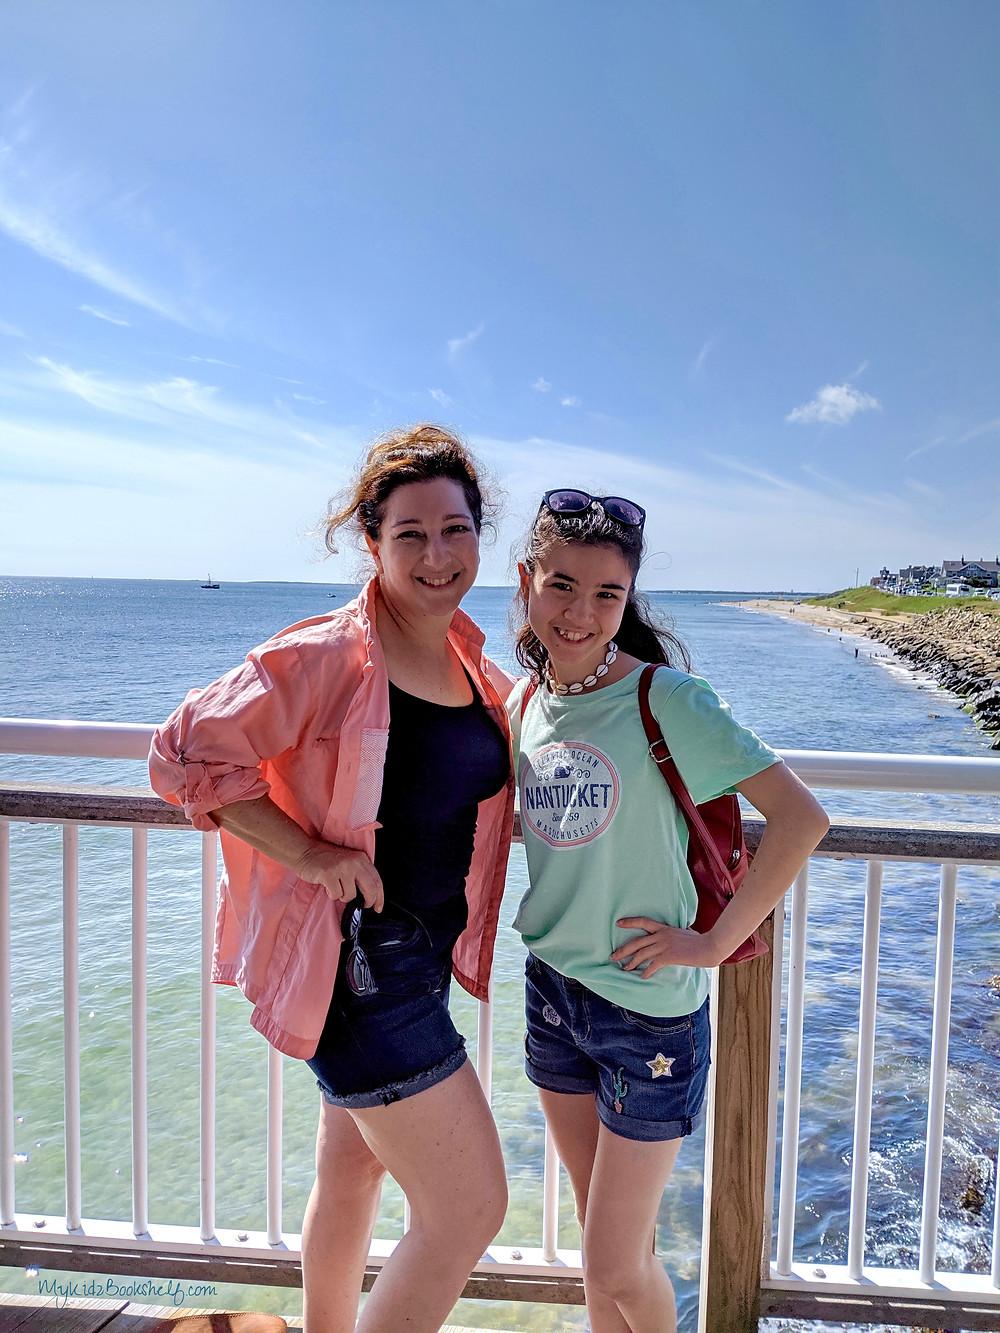 Seas-the-Day-at-Martha's-Vineyard-trip-Oak-Bluffs